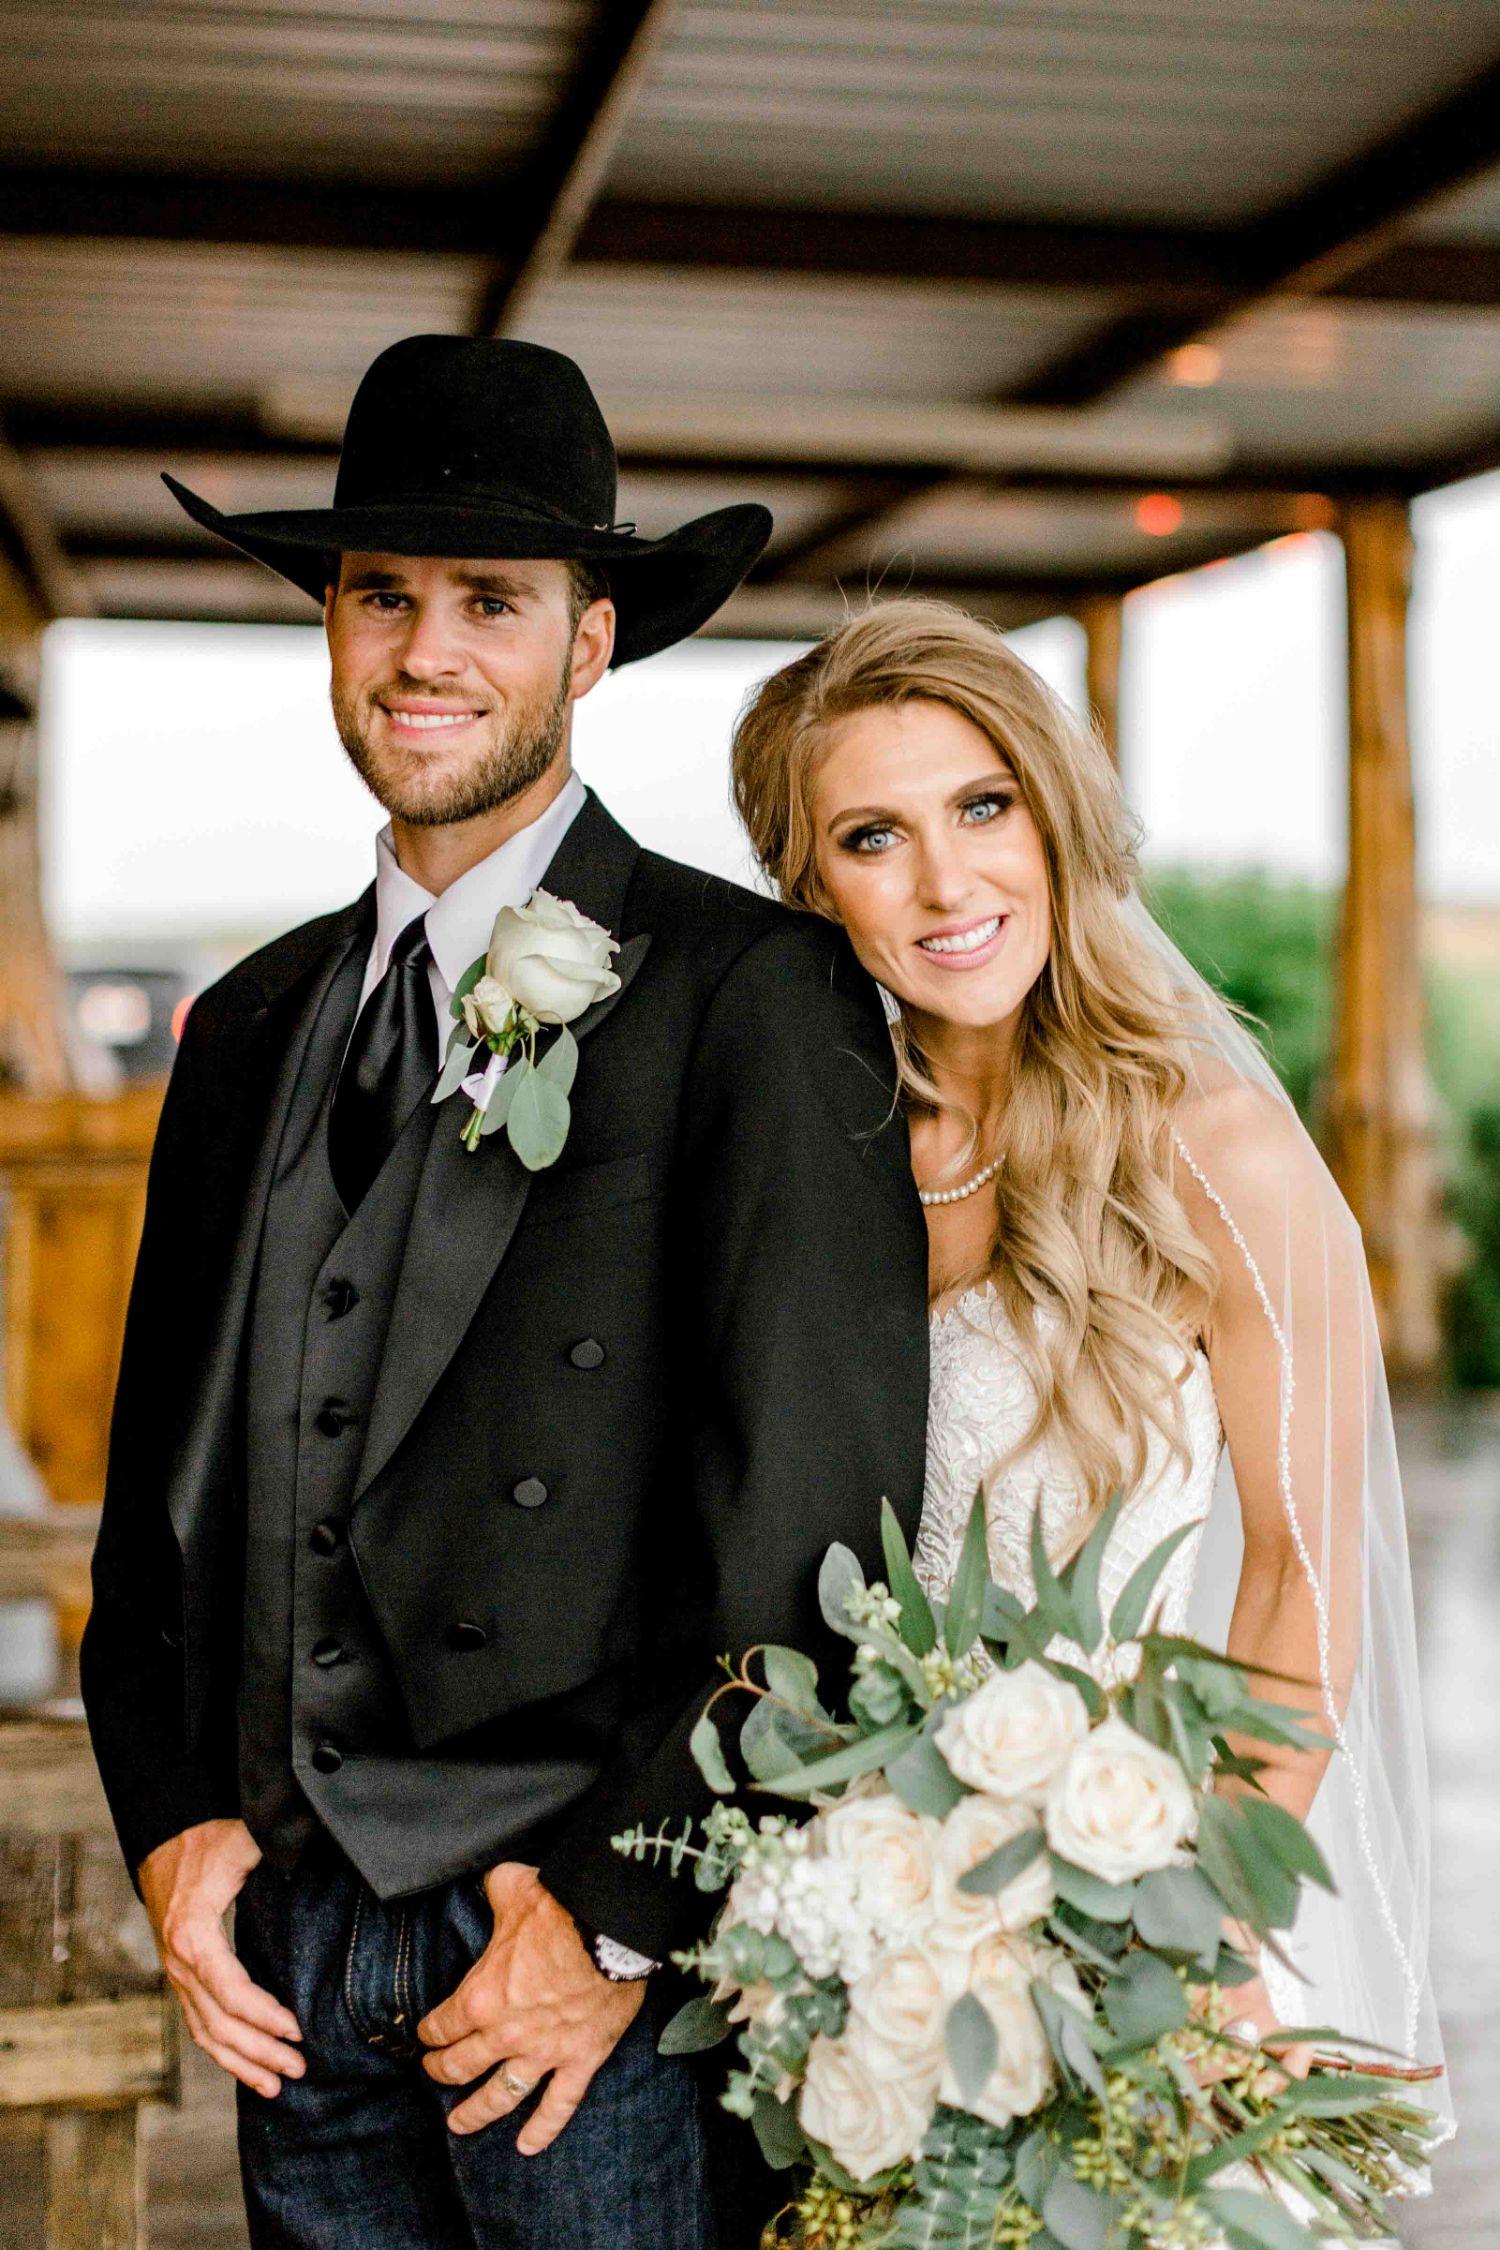 wichita-falls-wedding-katelyn-colten-vernon-texas-30.jpg